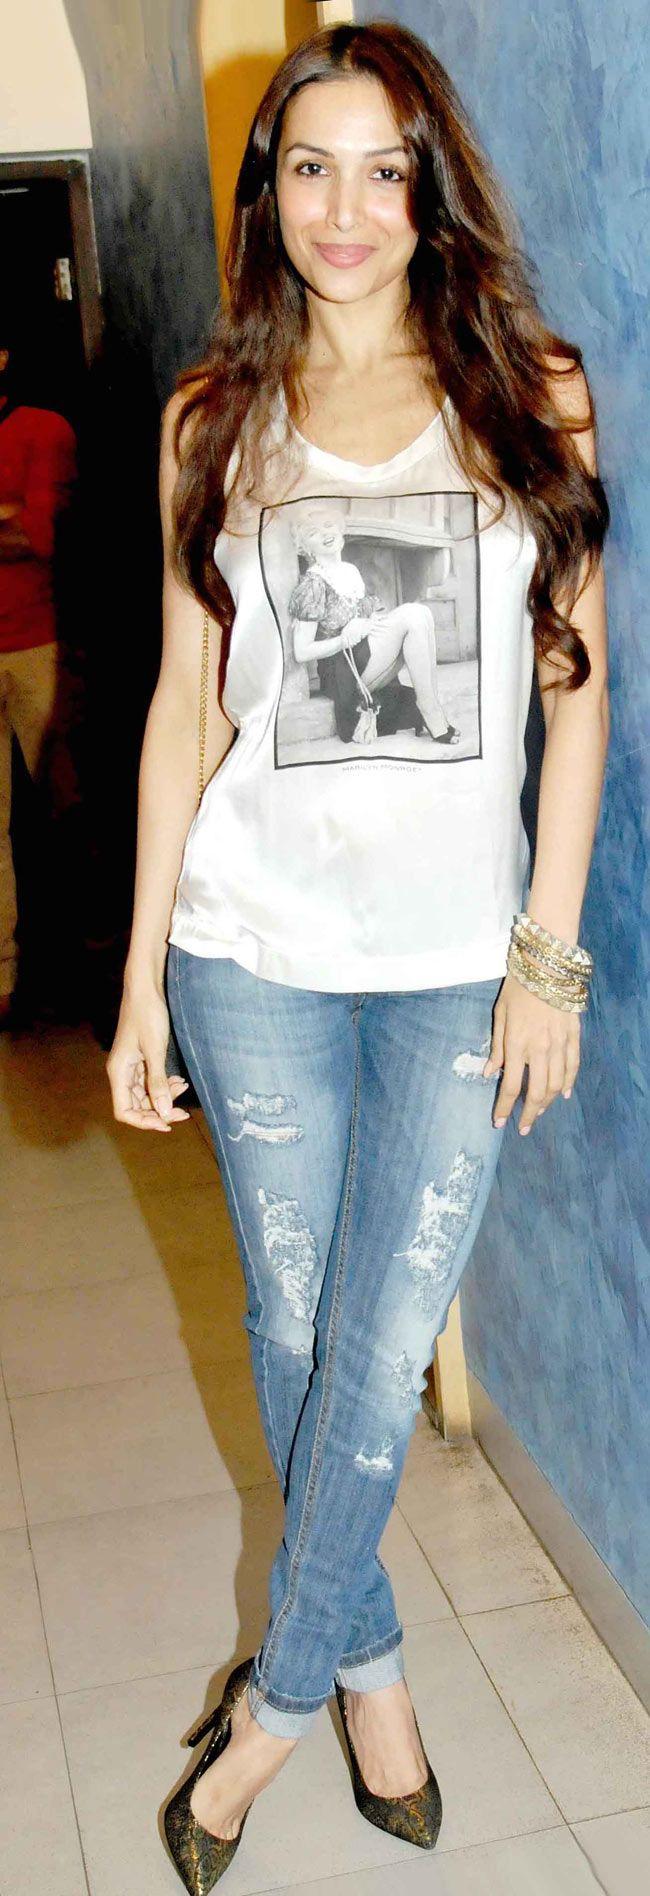 Malaika Arora Khan goes casual at the screening of 'Heropanti'.